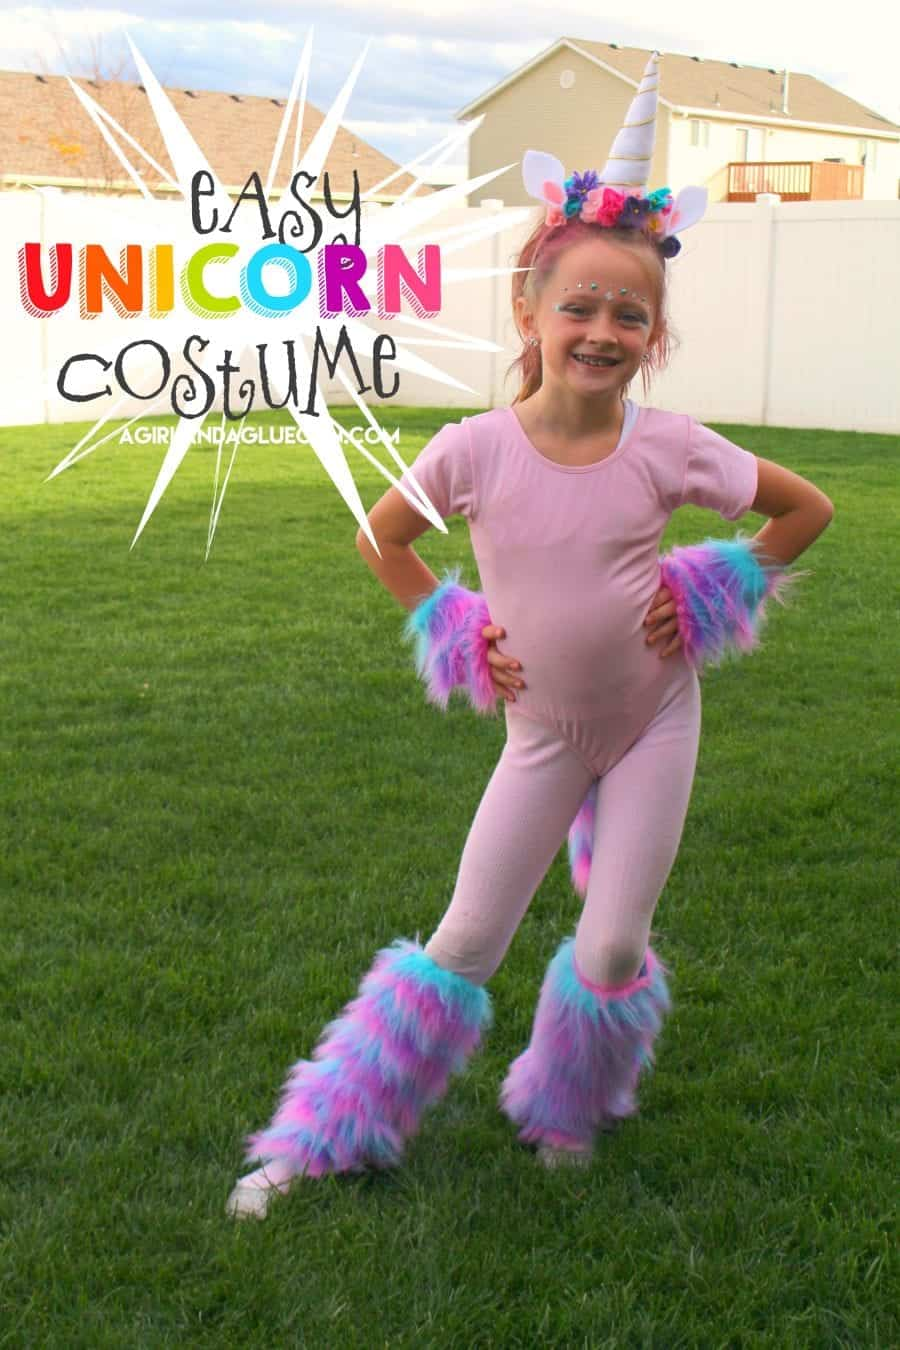 Unicorn costume diy a girl and a glue gun unicorn costume diy solutioingenieria Choice Image